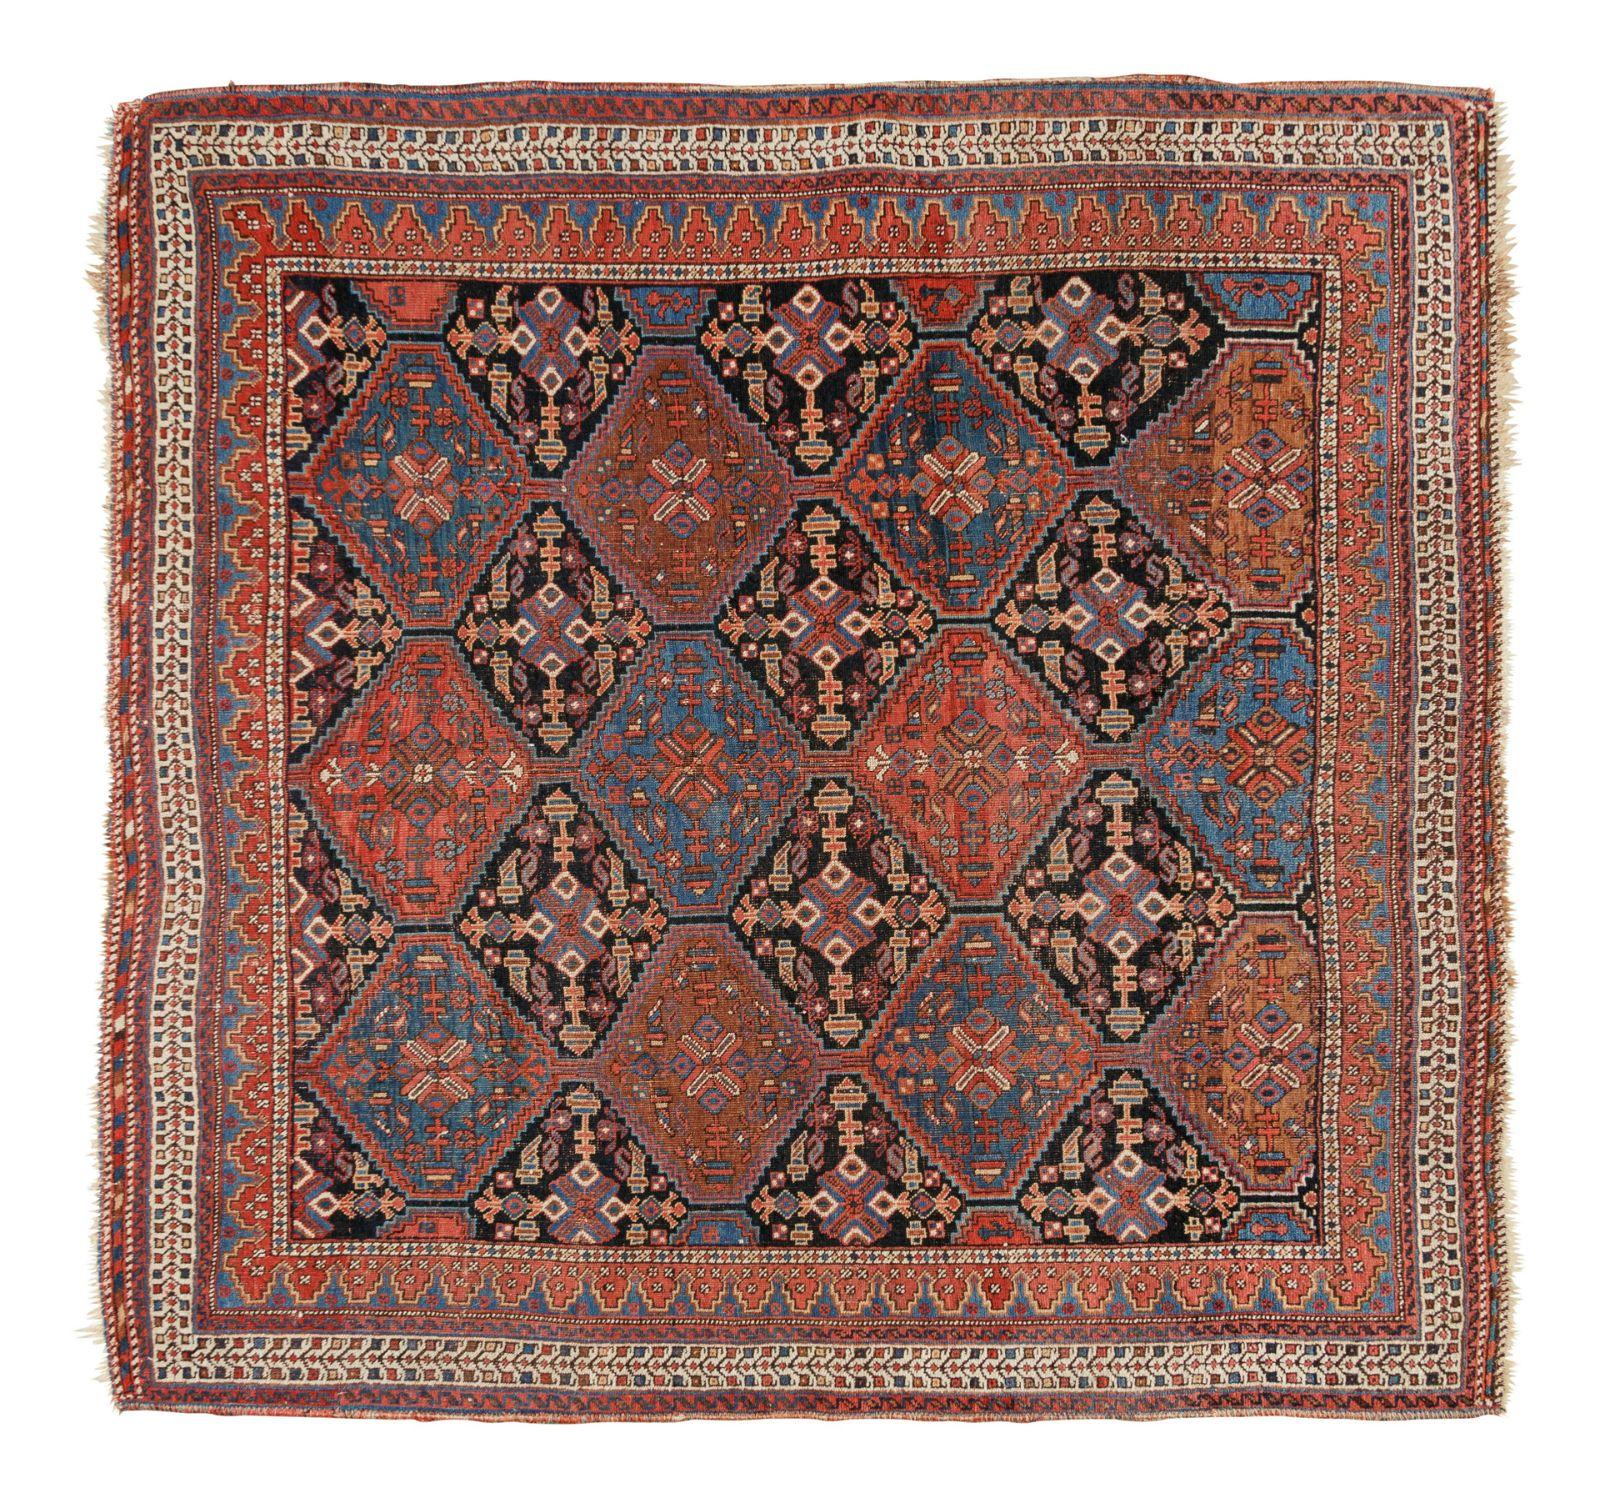 An Afshar Wool Rug